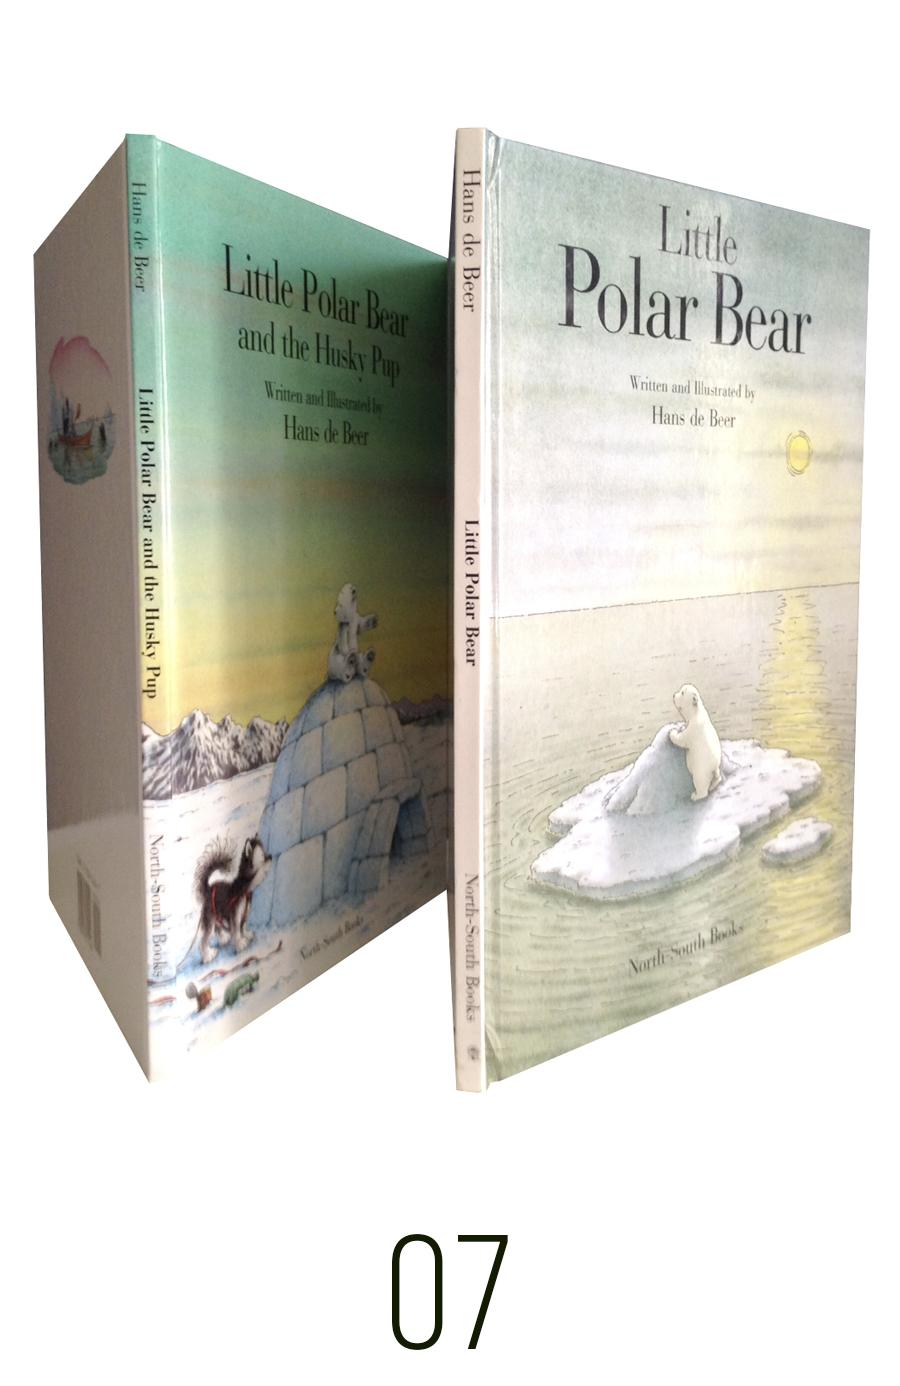 Little Polar Bear